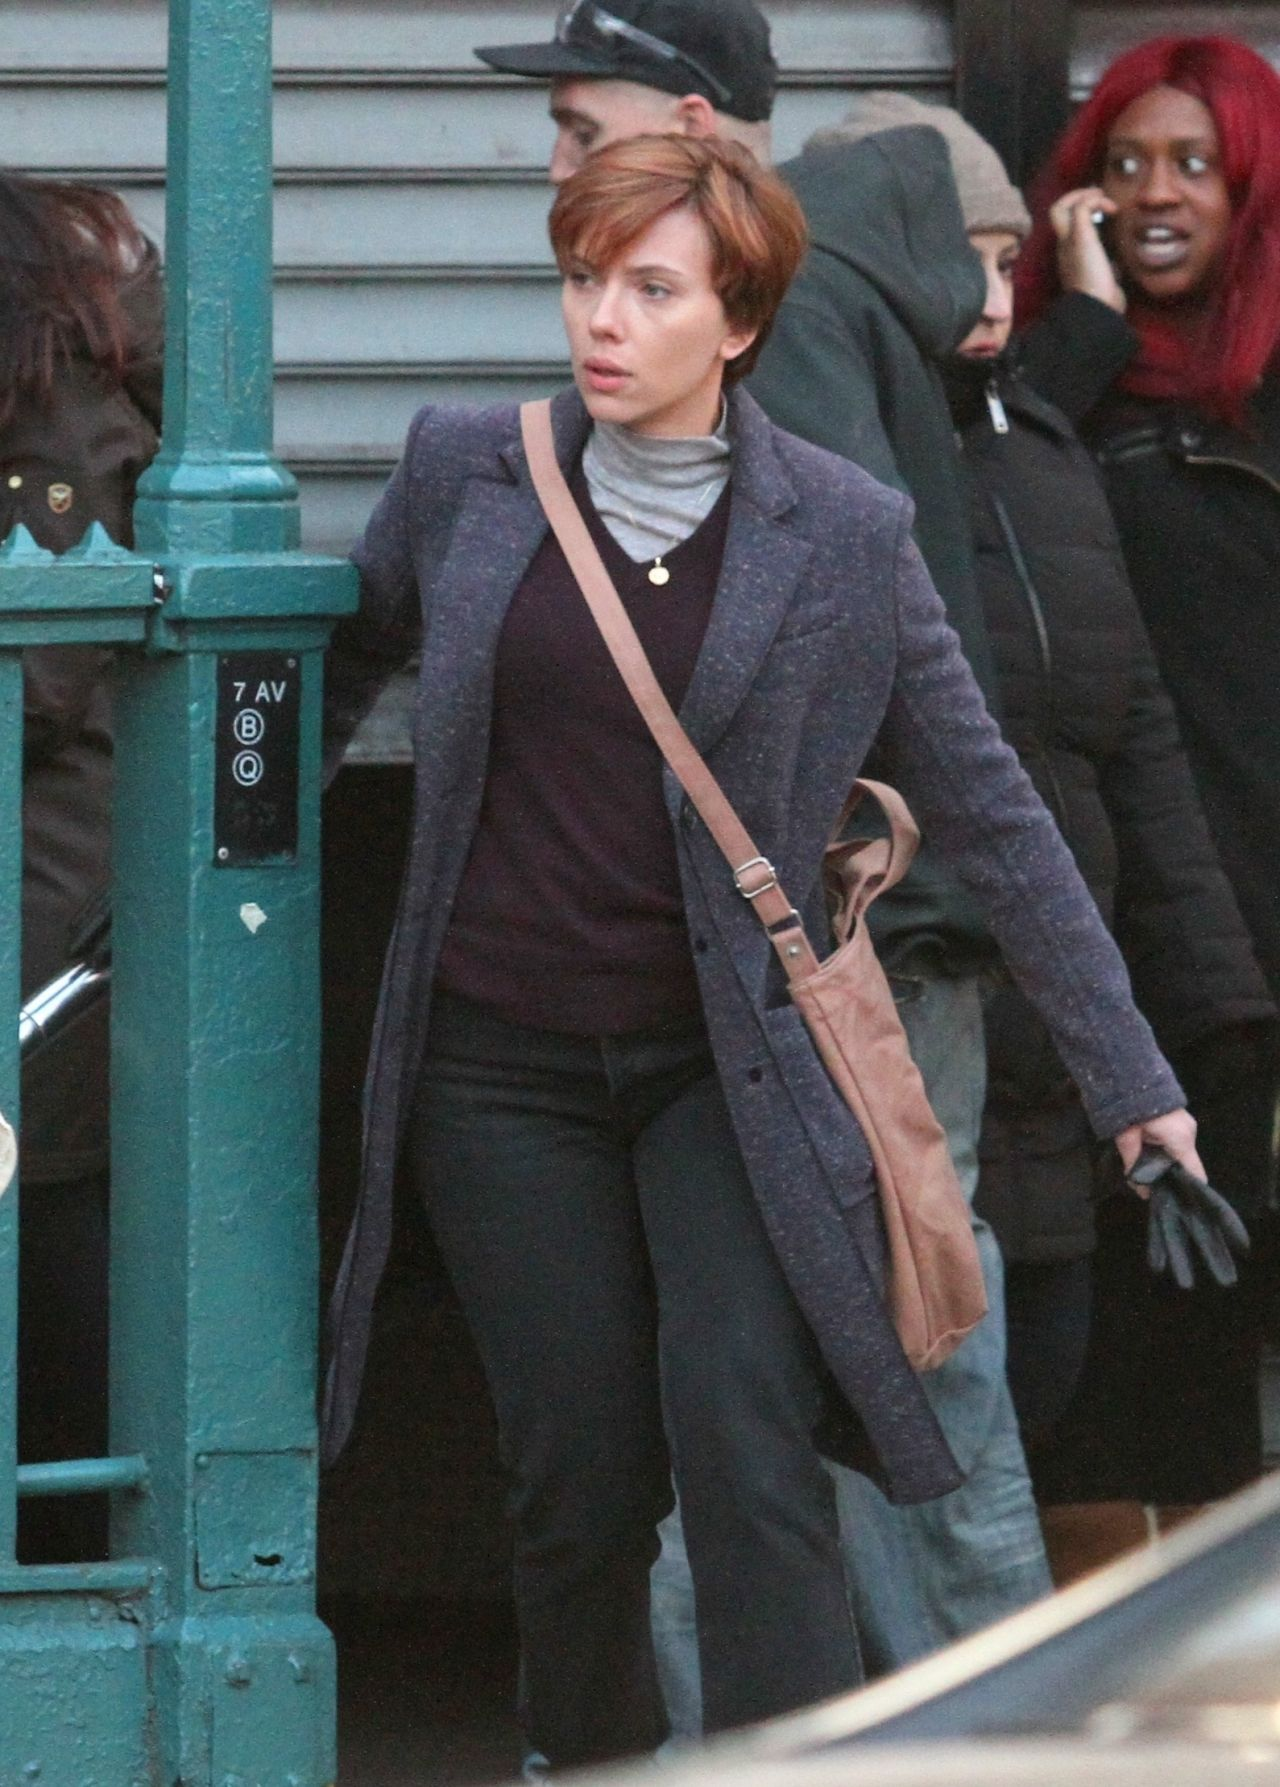 Scarlett Johansson - Filming Noah Baumbach's, Untitled Film Project